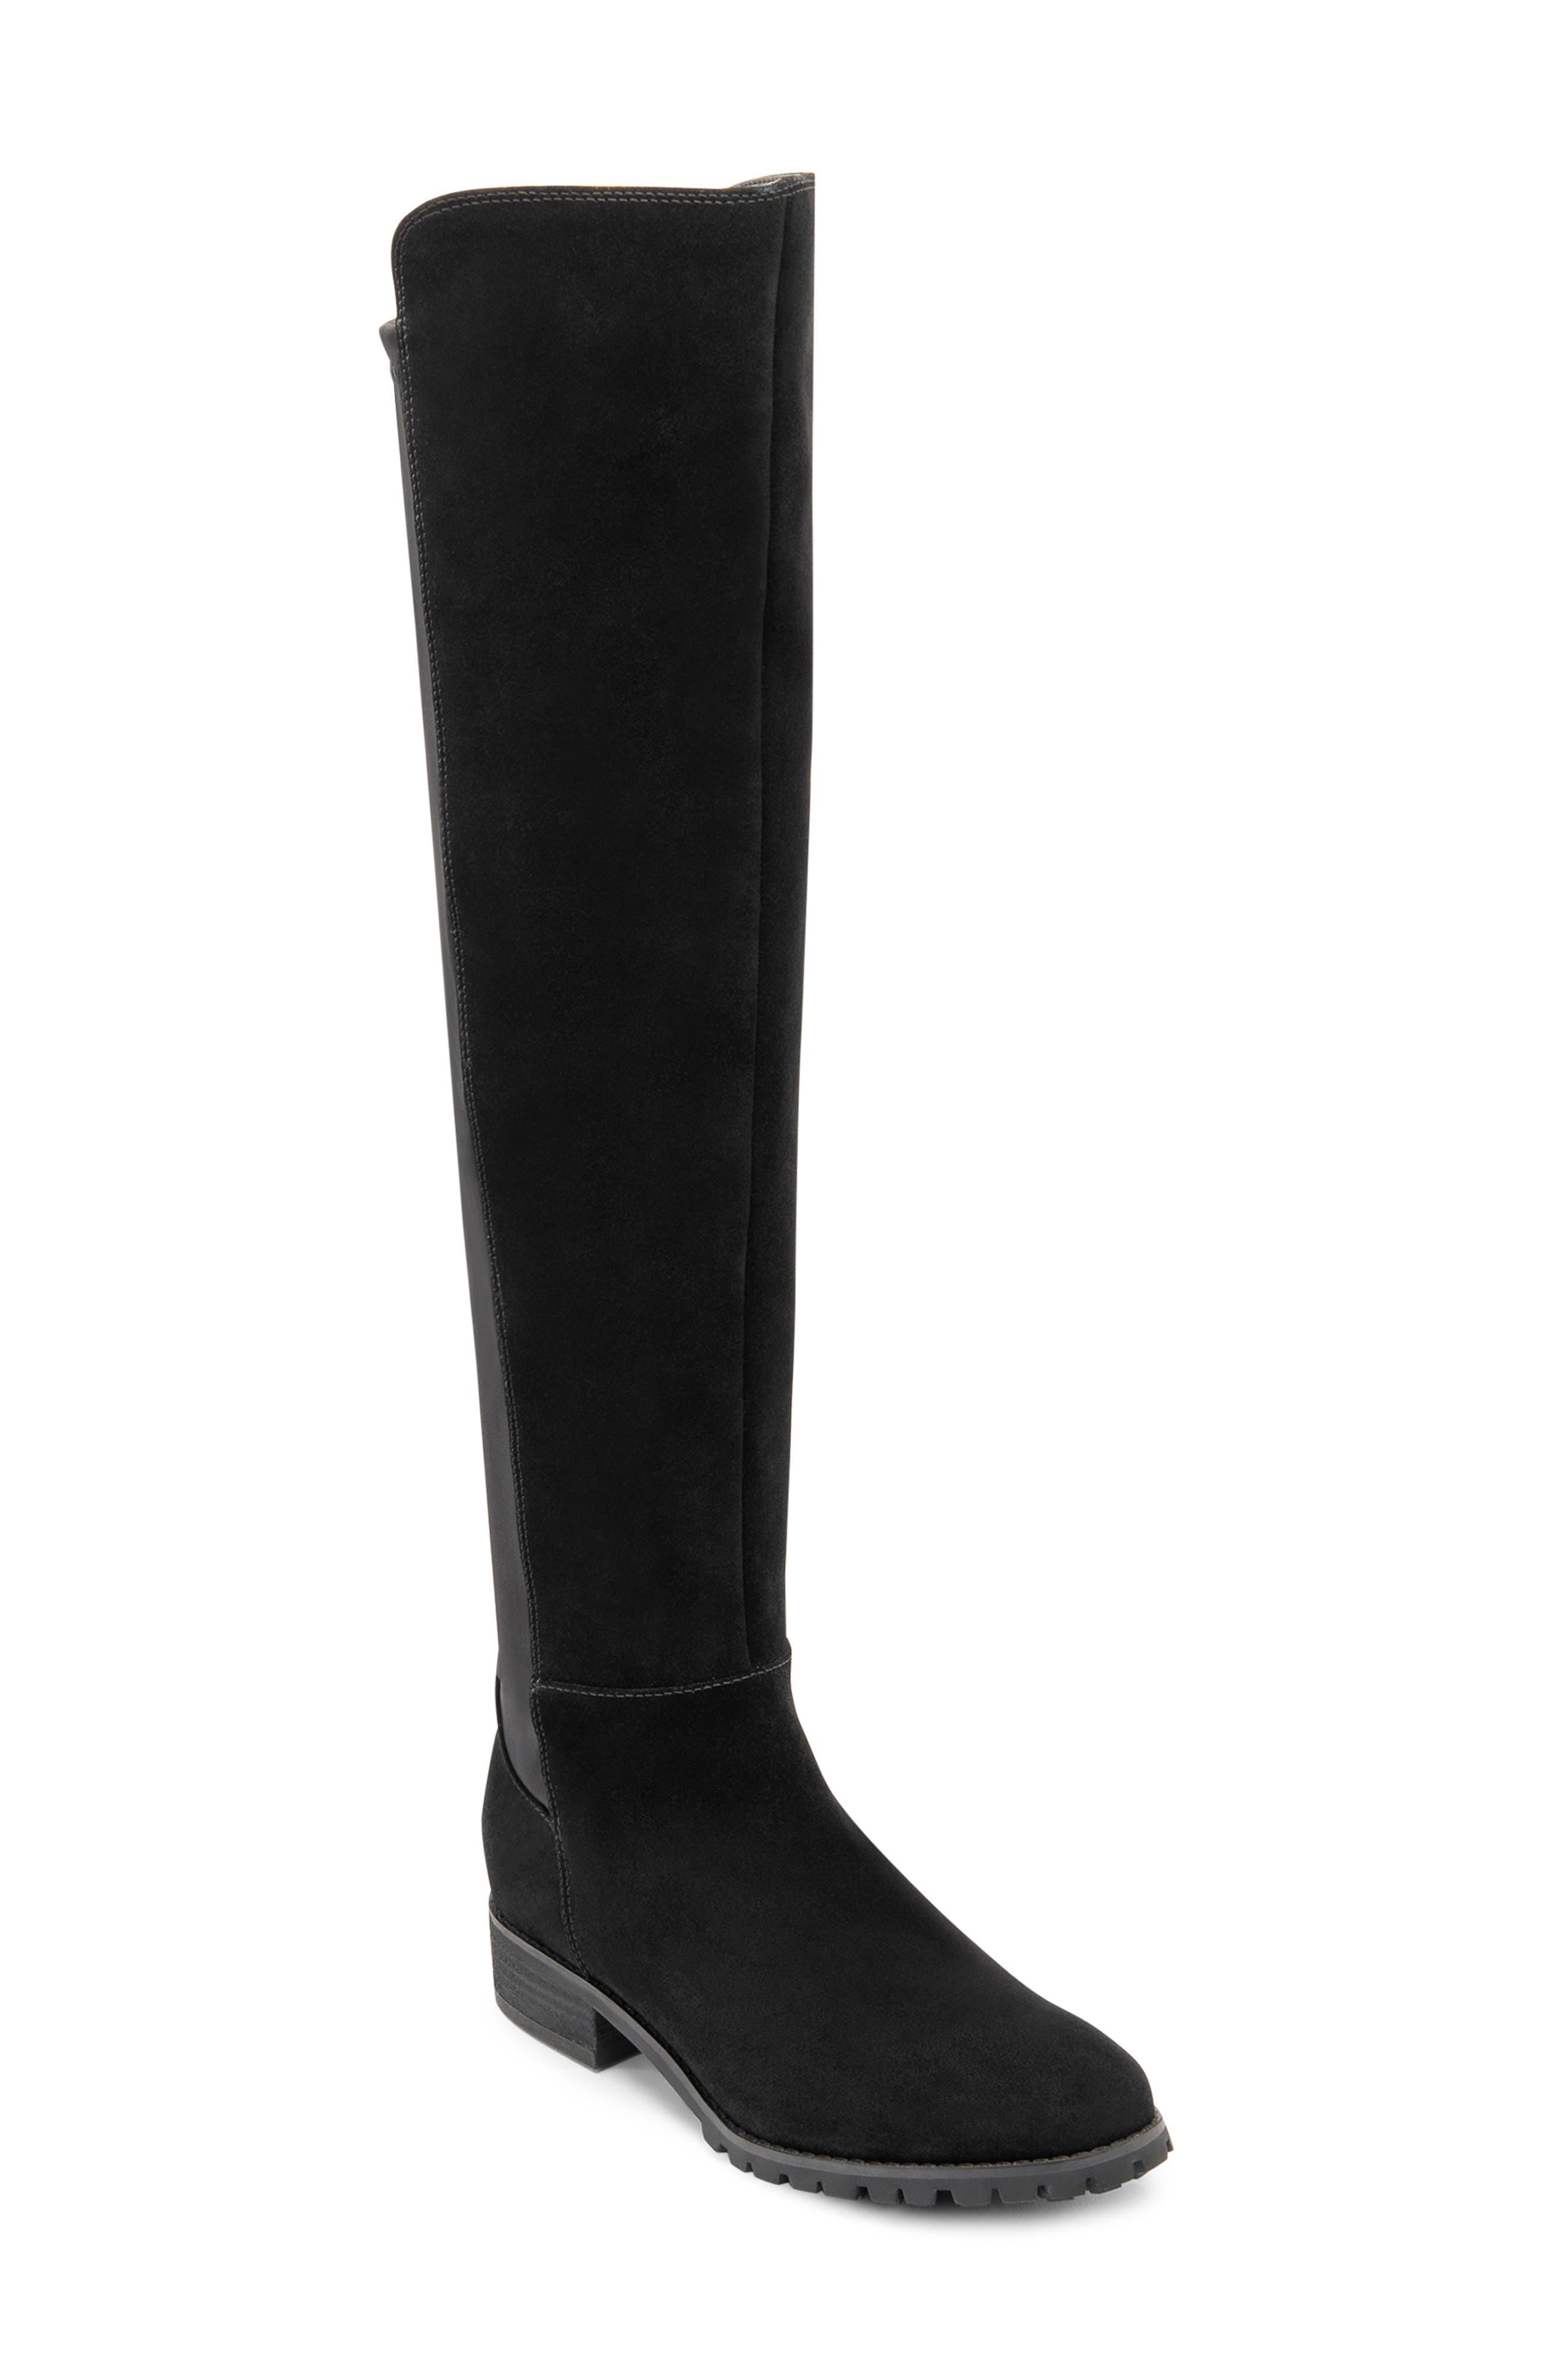 Blondo Presto Waterproof Knee High Boot (Women)